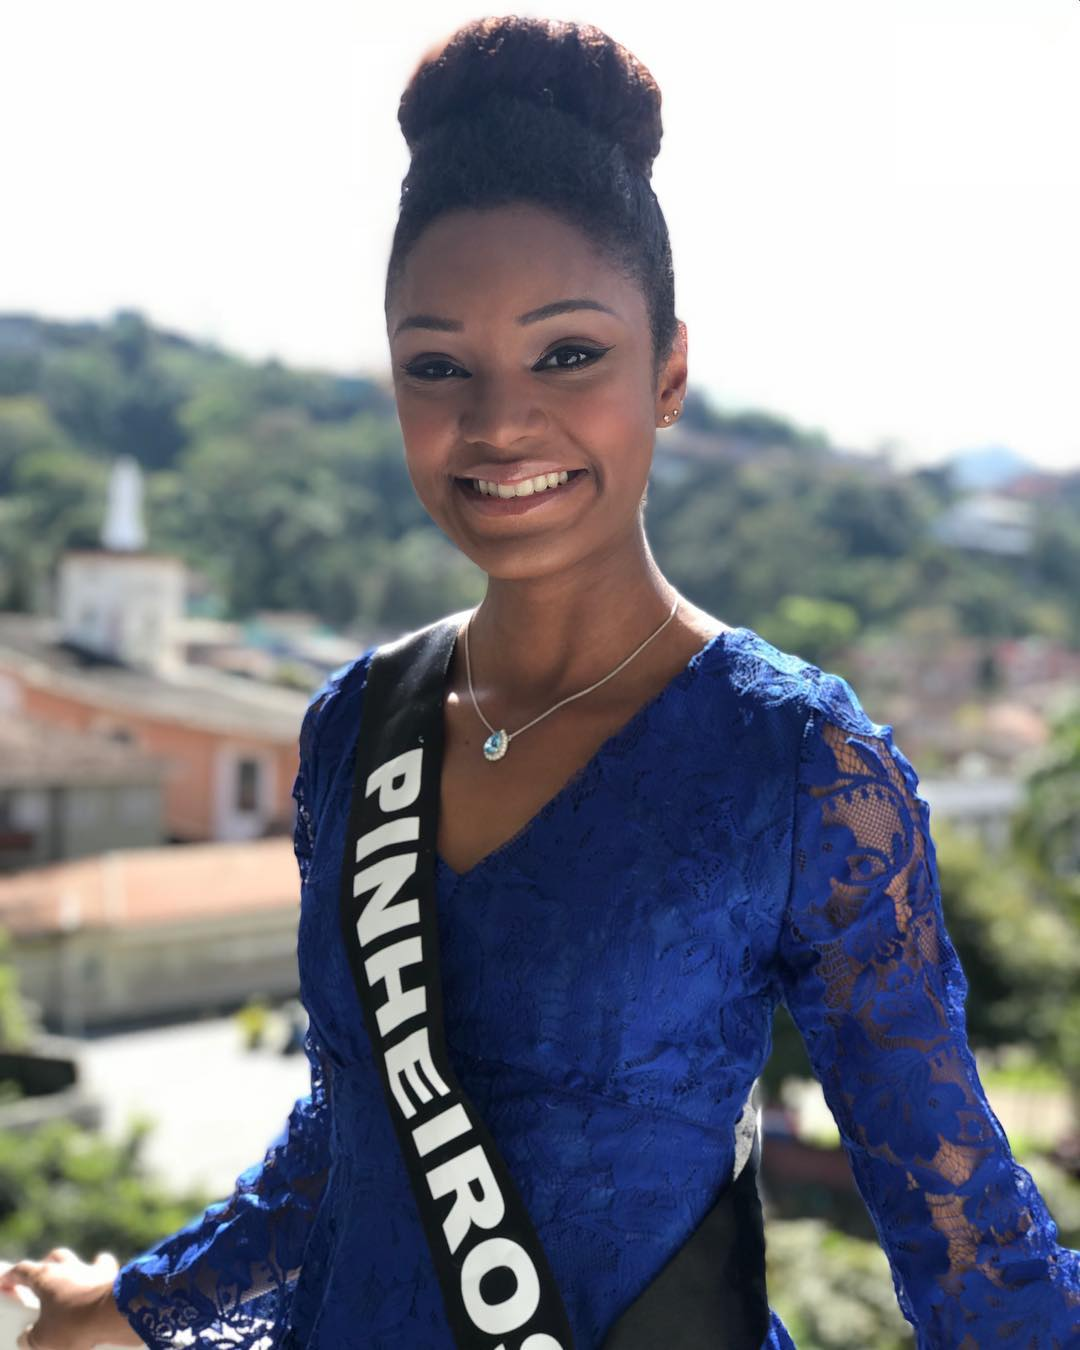 thaina de oliveira, miss teresopolis 2019. - Página 3 38636610